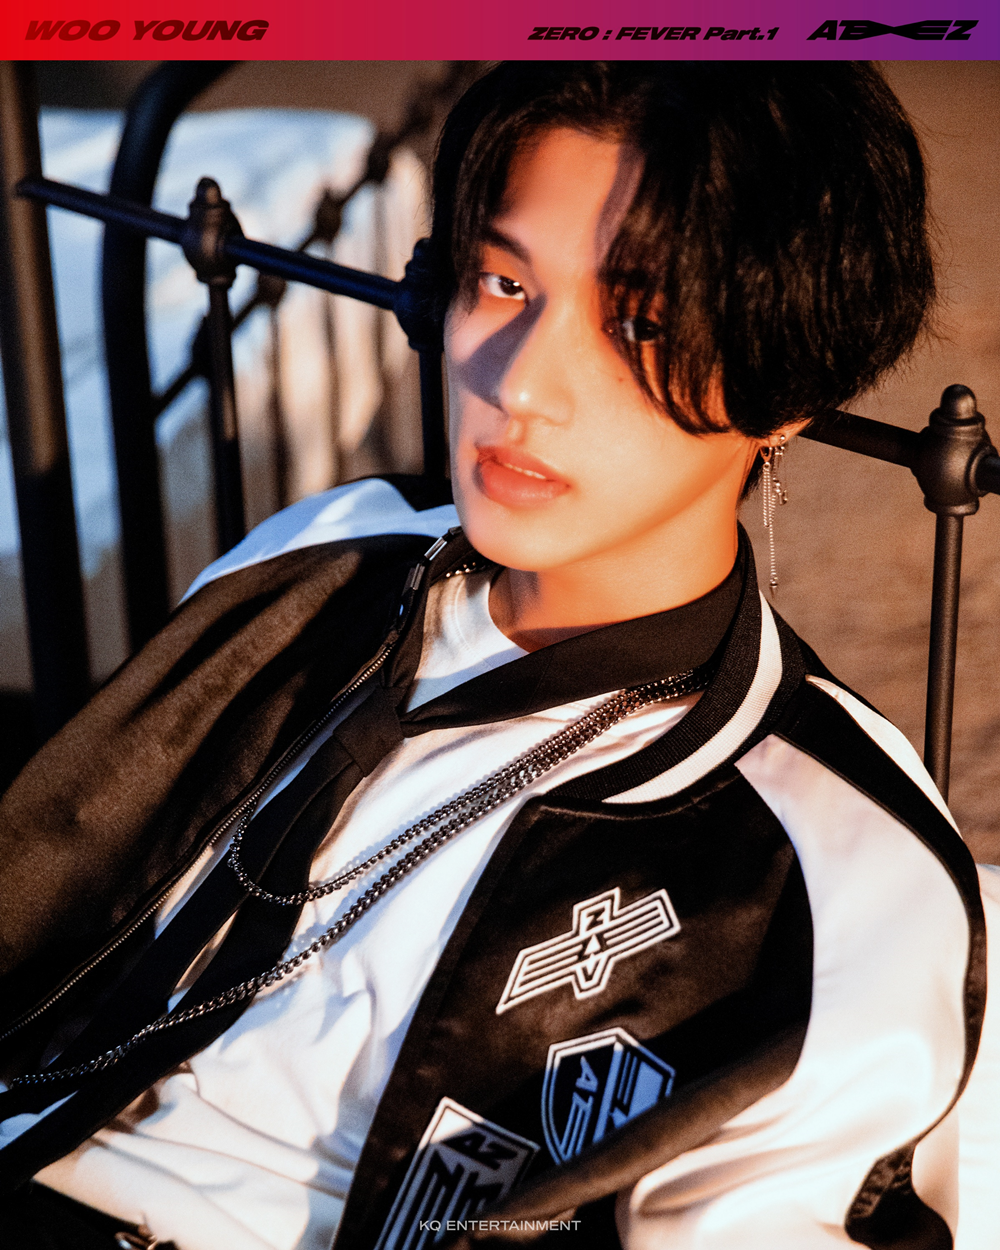 Wooyoung (ATEEZ)